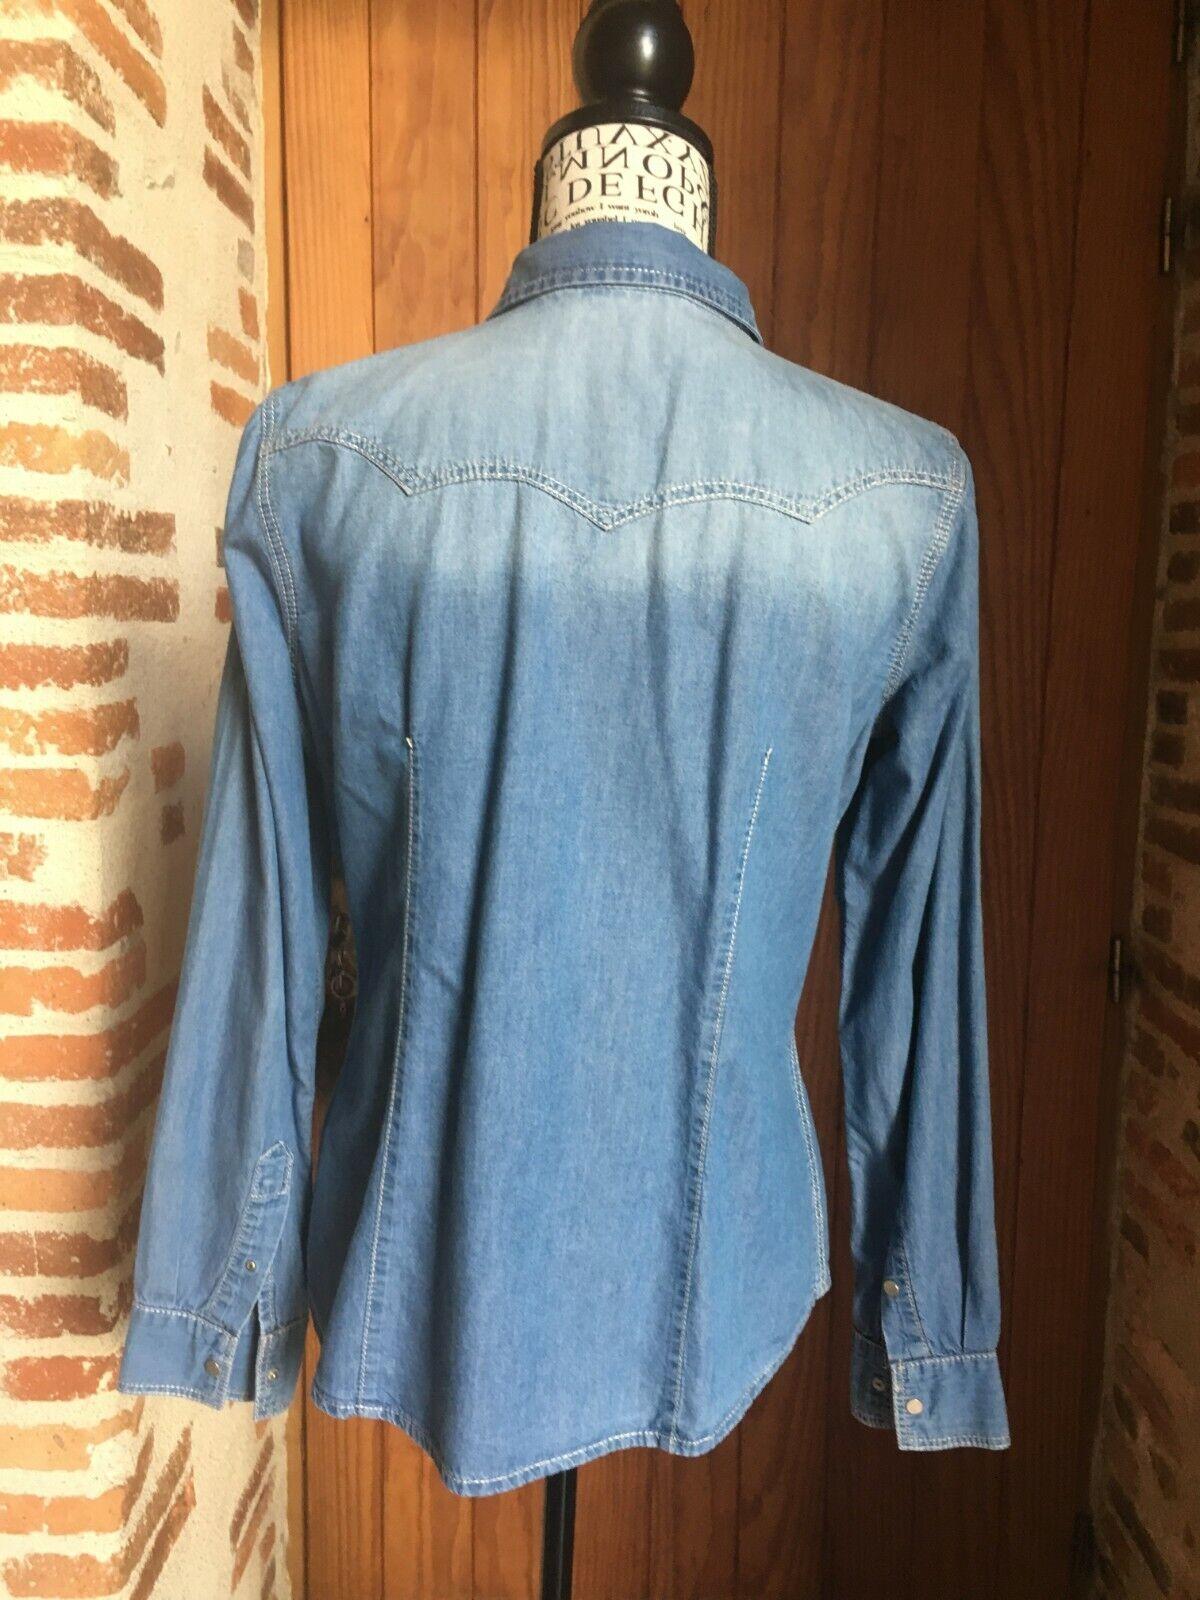 Camaieu chemise en jean femme taille 38